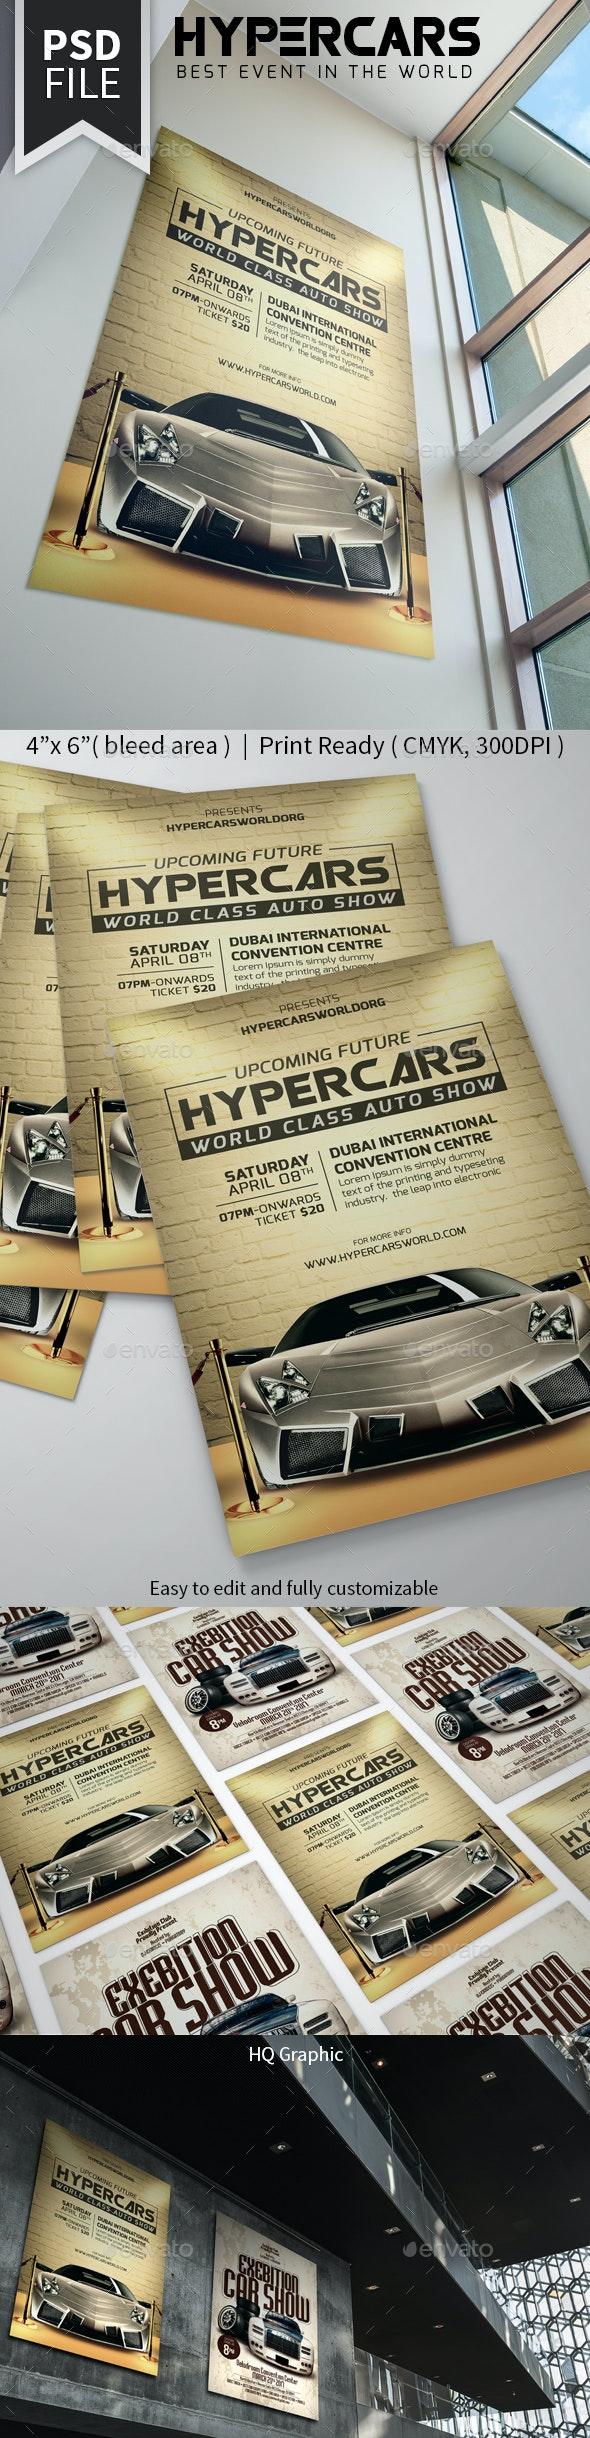 Hypercars Auto Show Flyer - Events Flyers